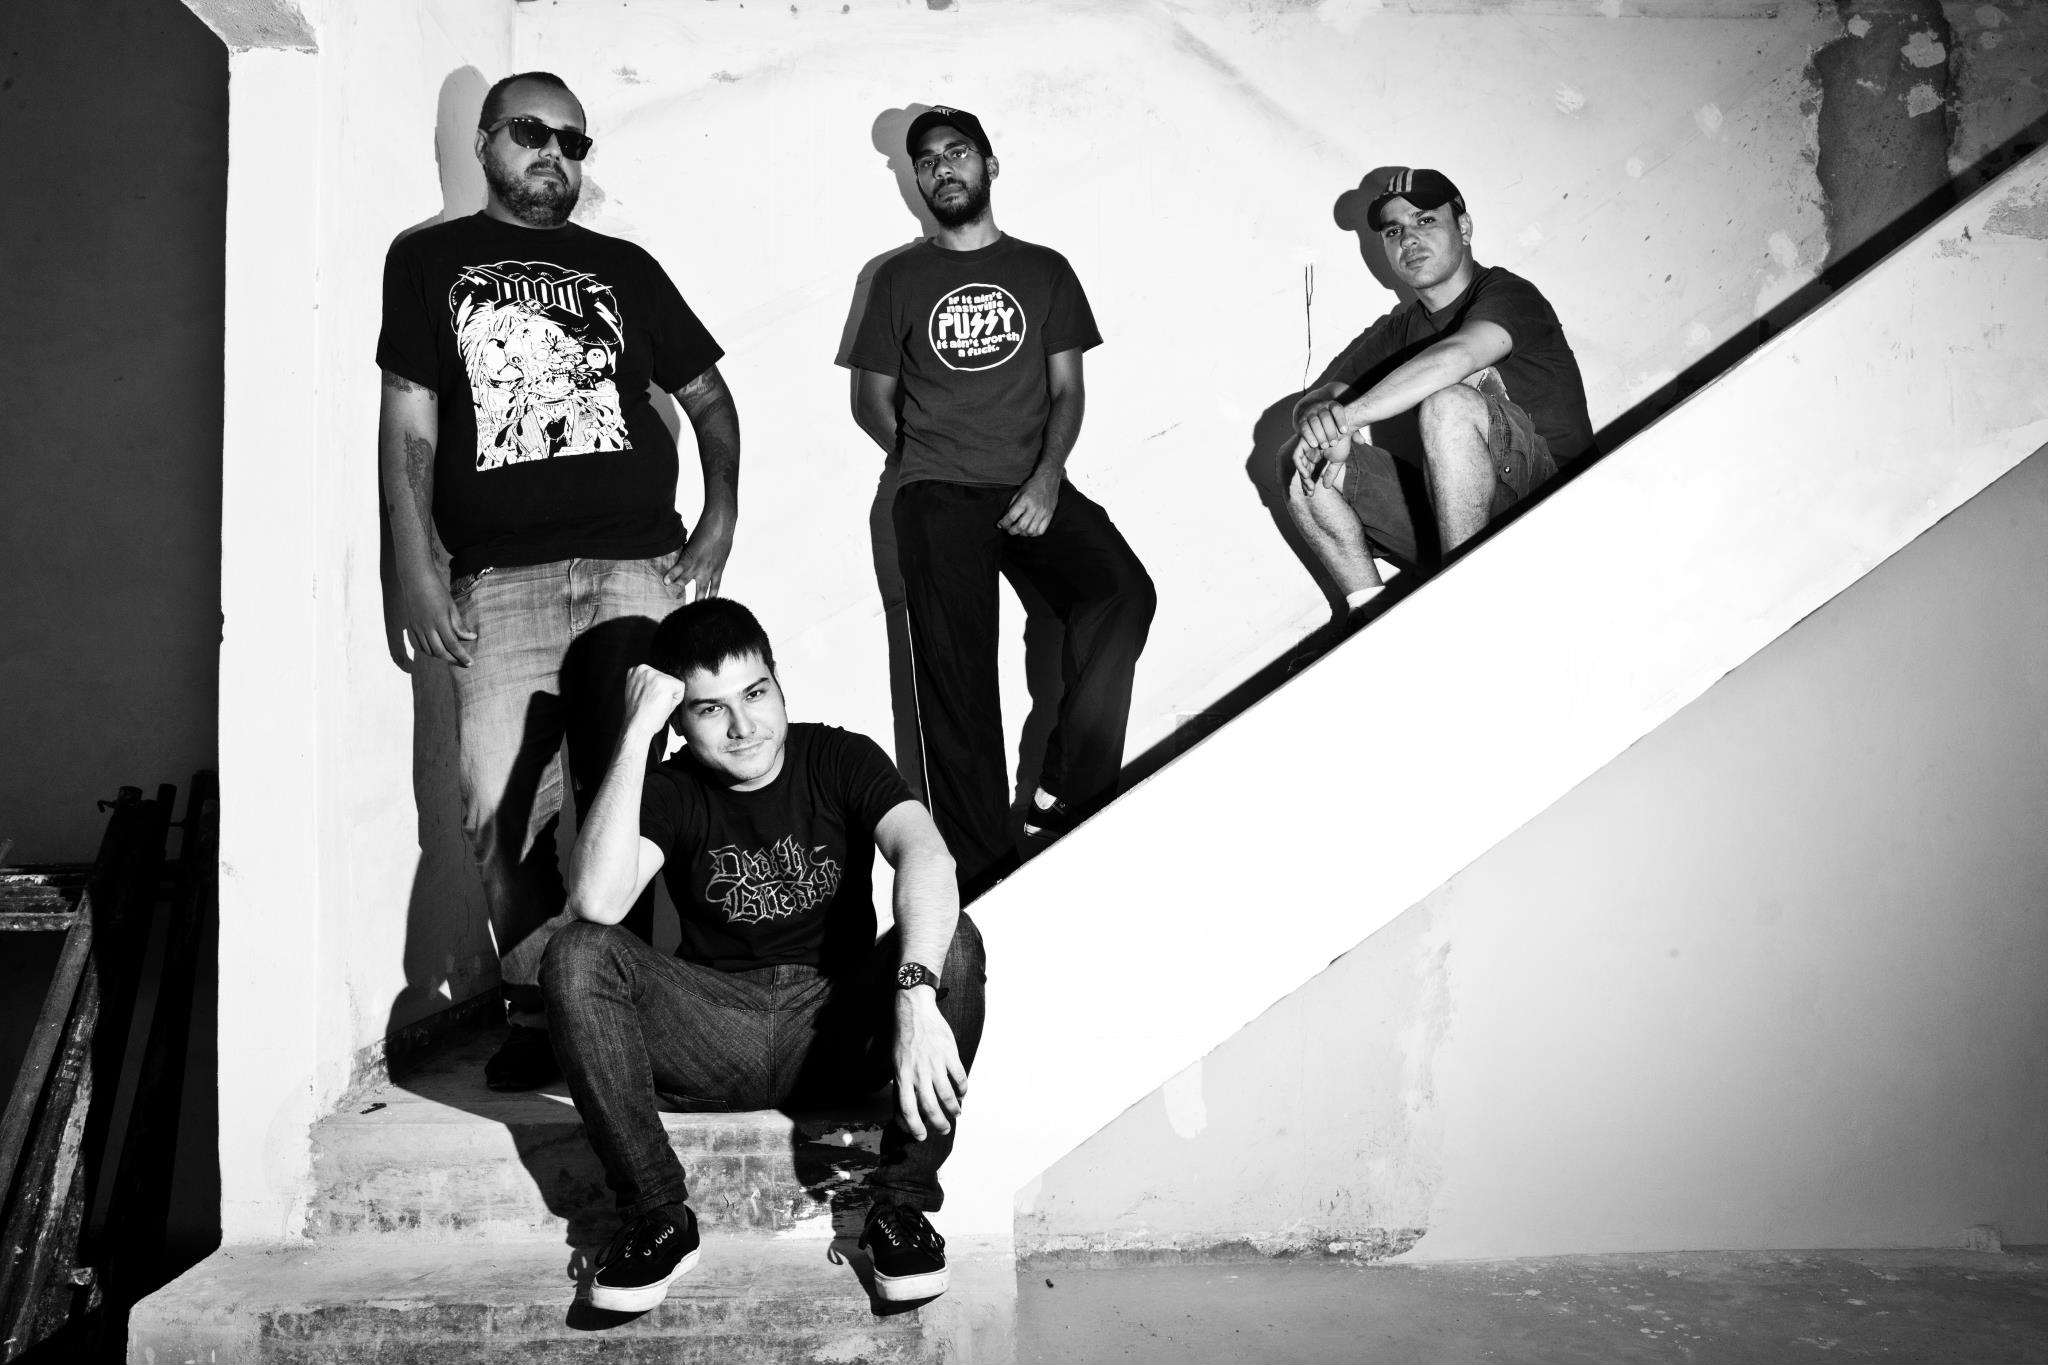 D.E.R band